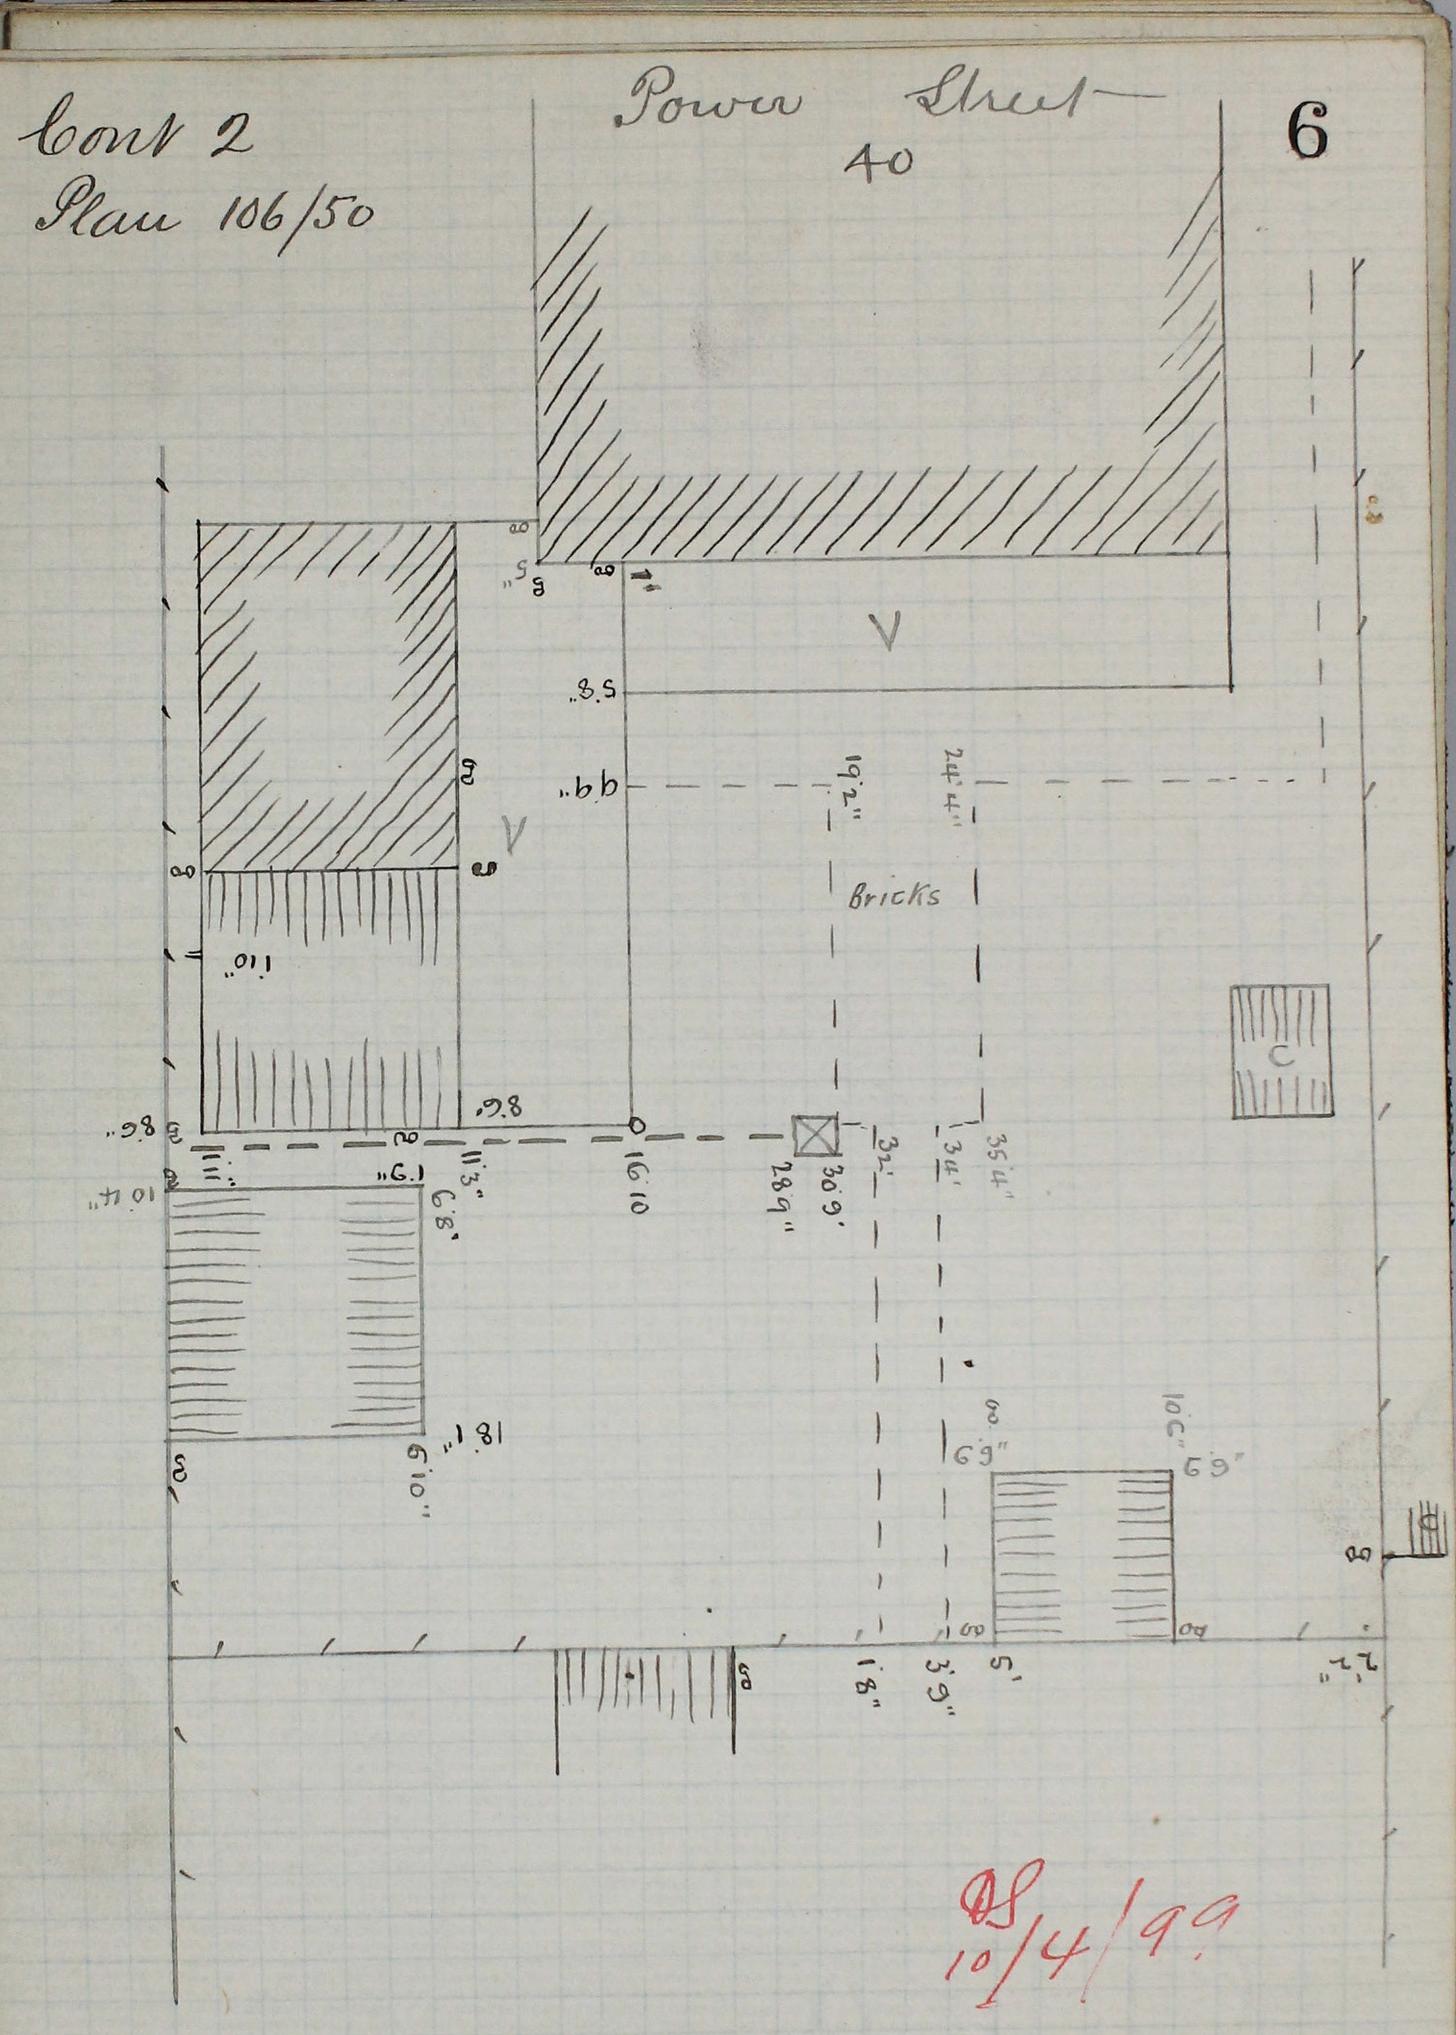 MMBW, Fieldbooks, VPRS 8600/P1 Unit 86, Book 1473, p.6.